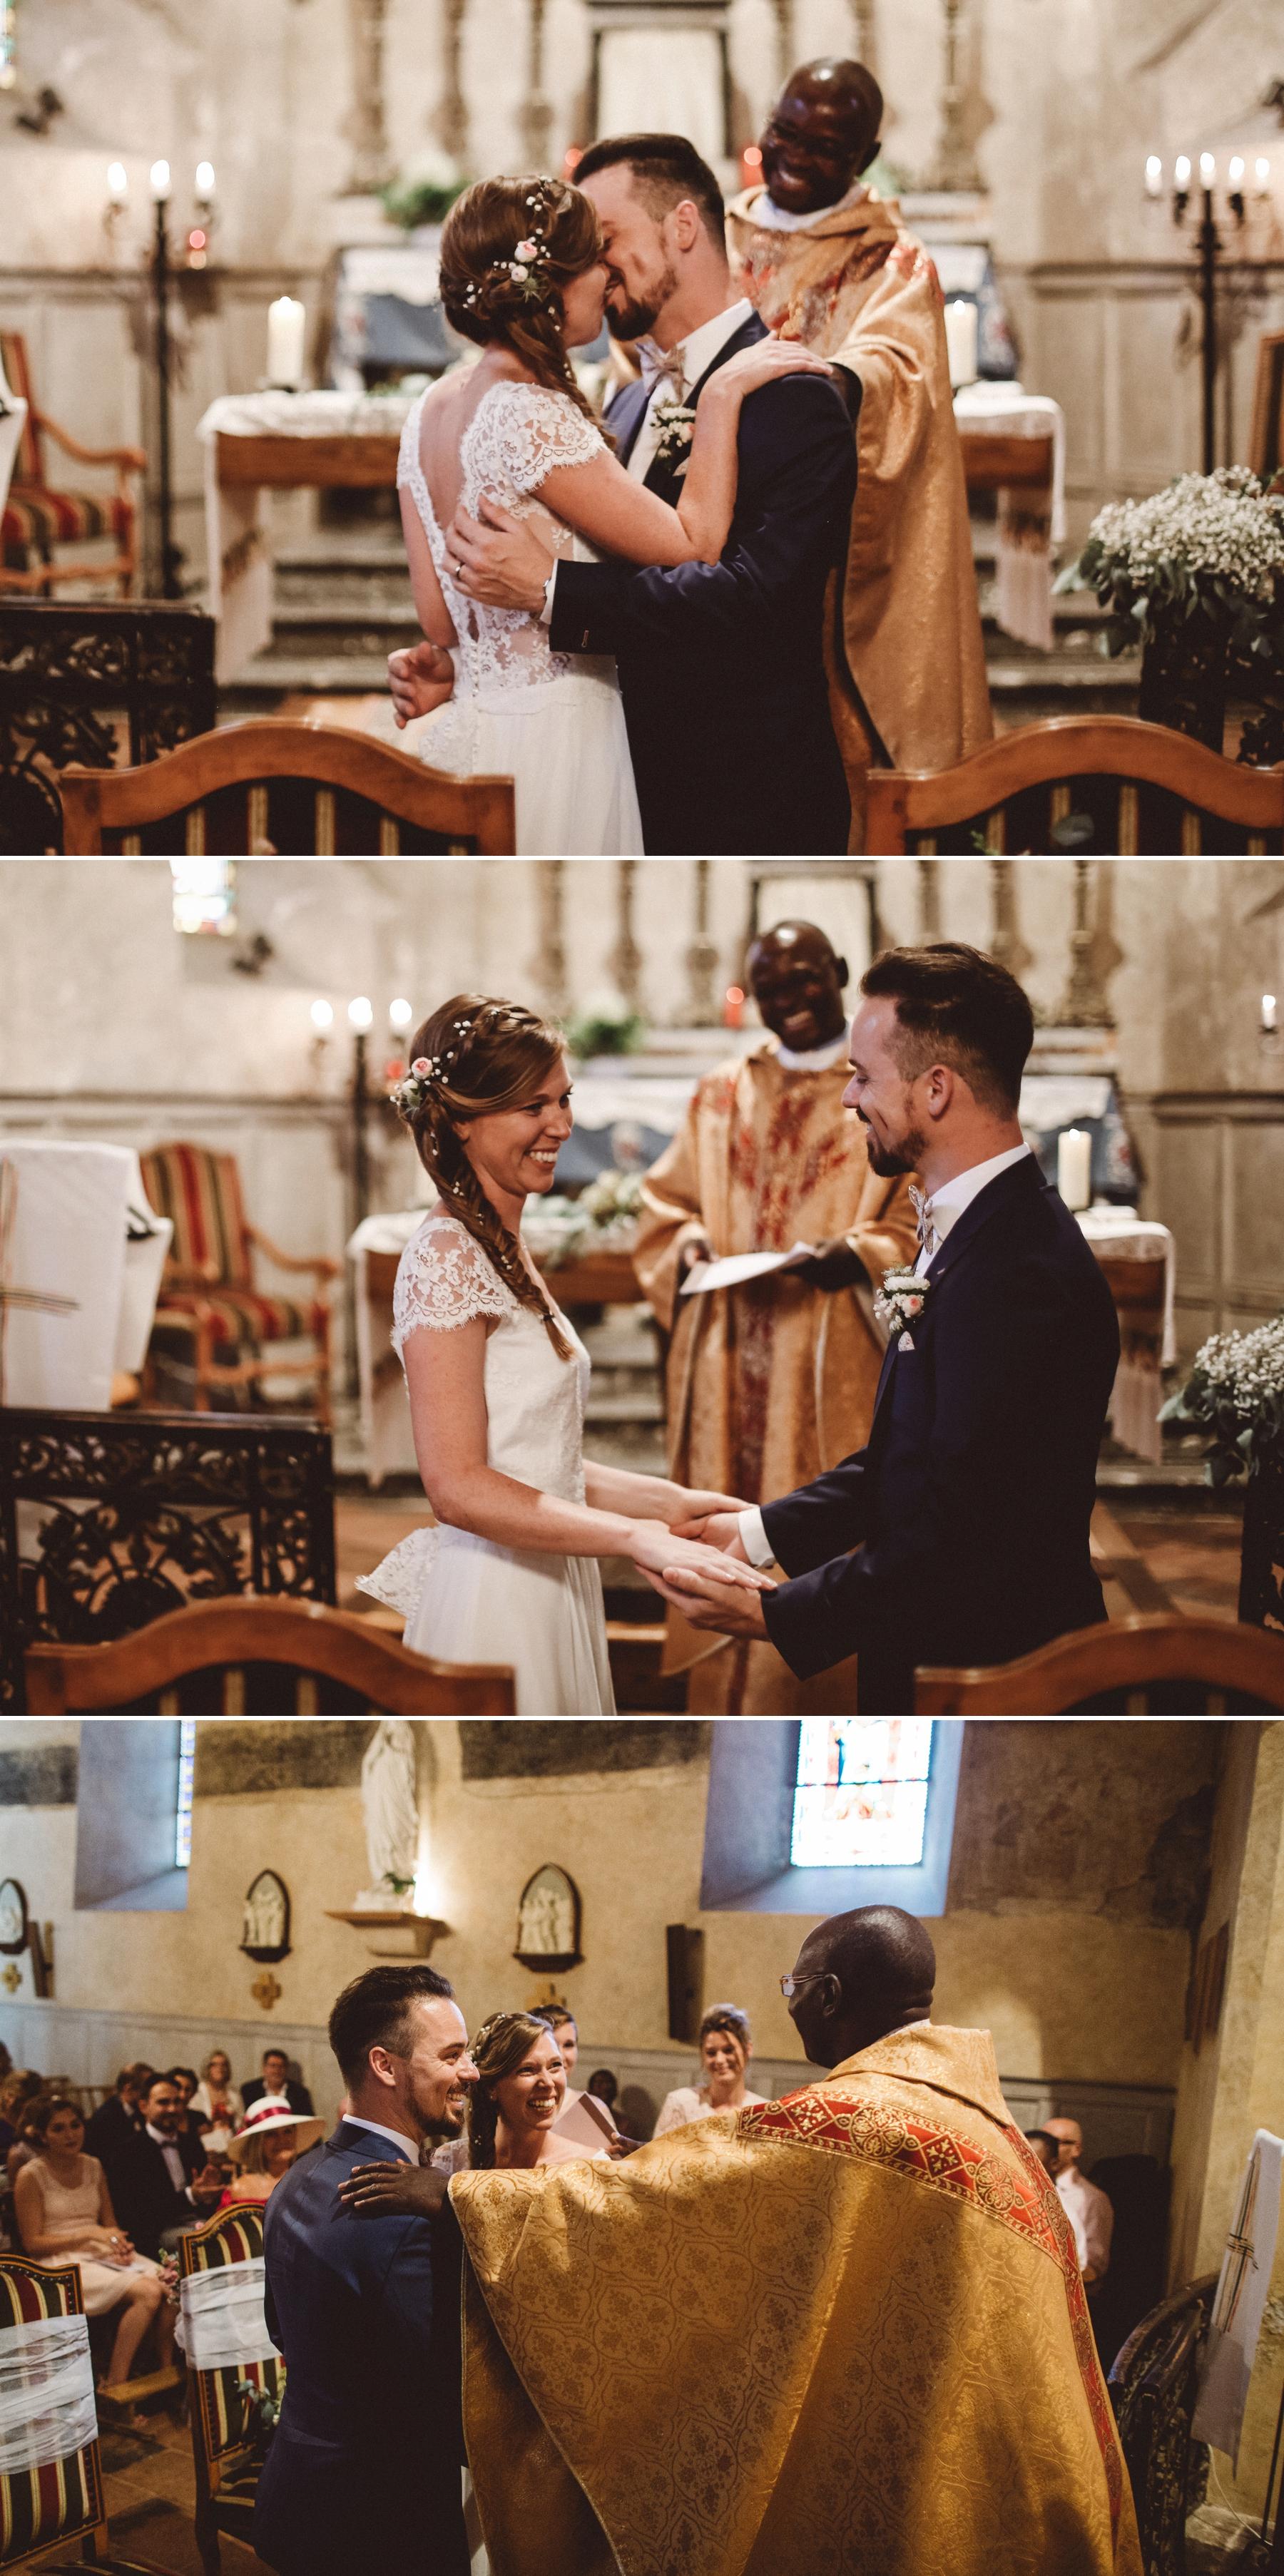 mariage-domaine-montjoie-toulouse_0022.jpg